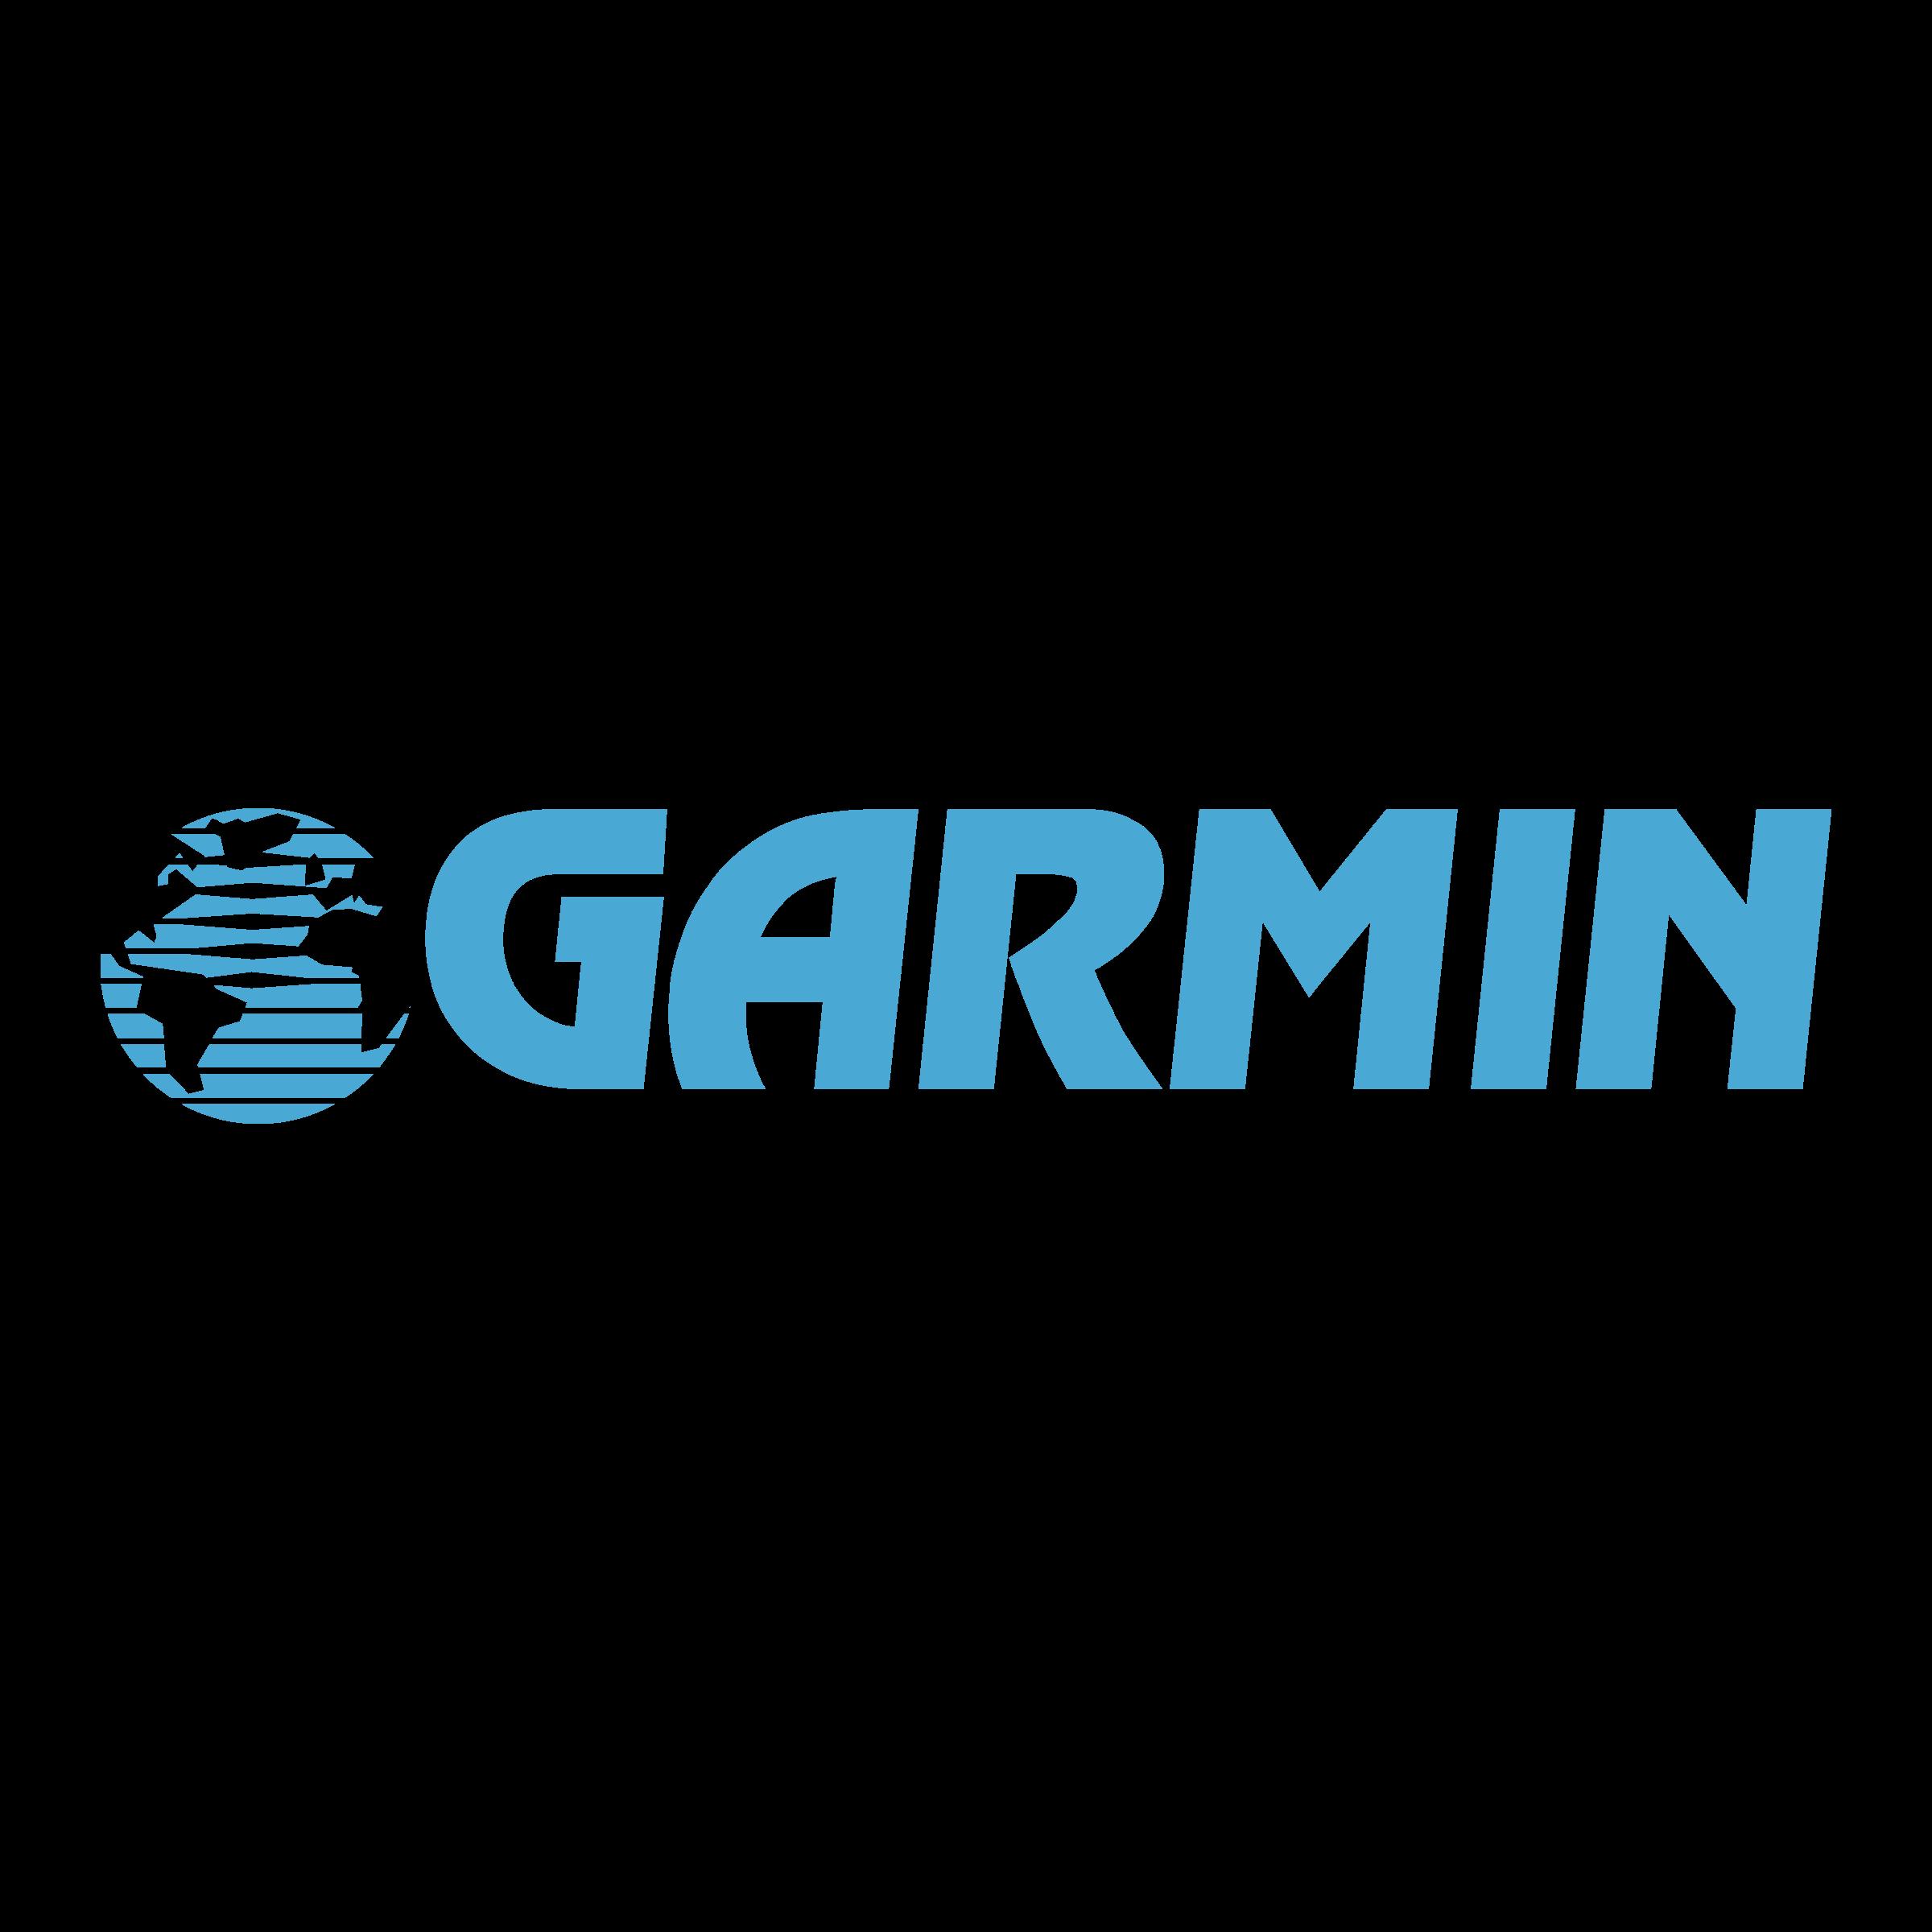 garmin logo png transparent amp svg vector freebie supply